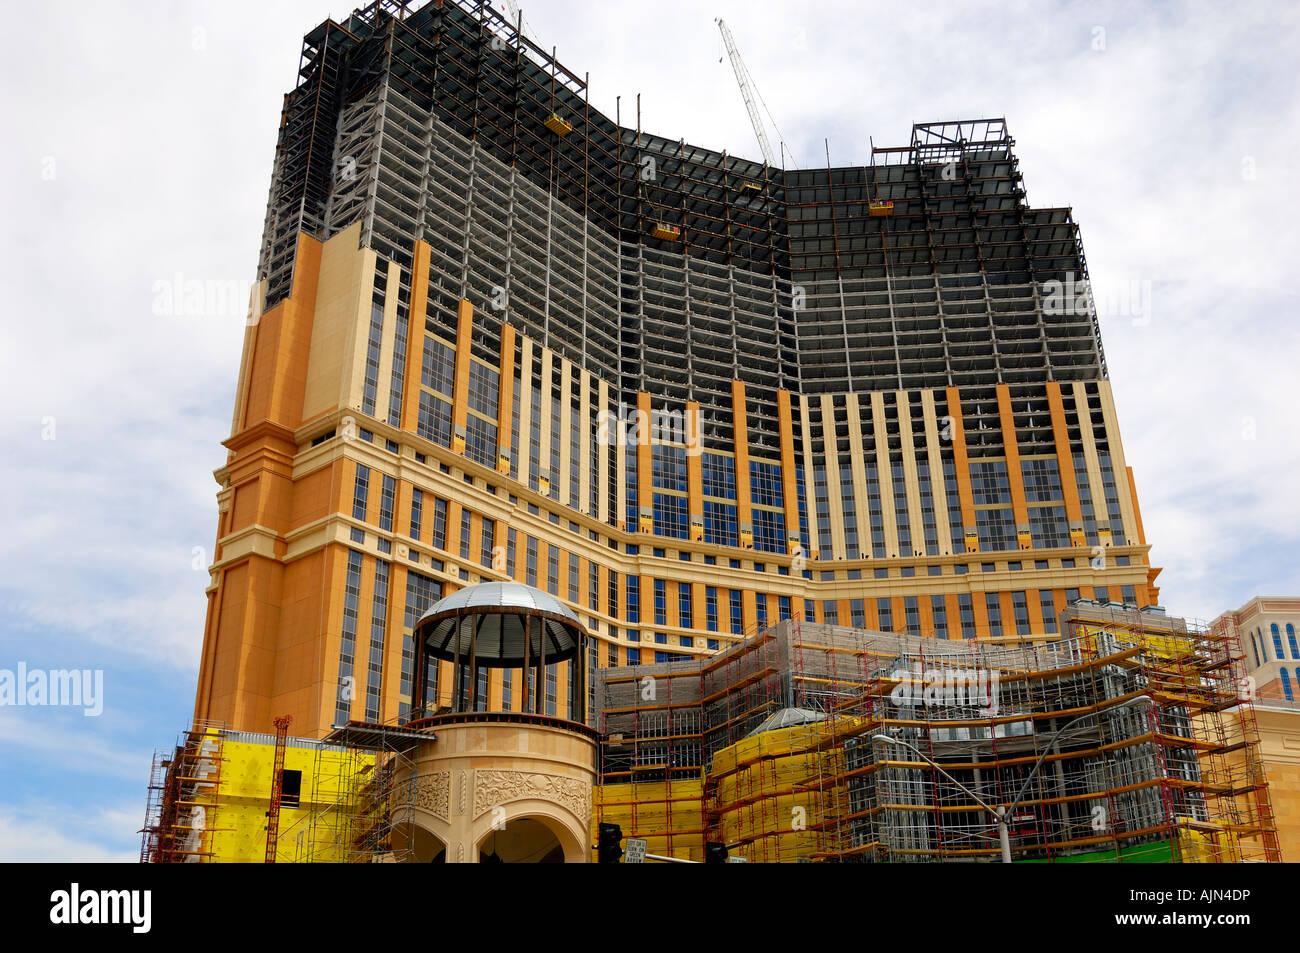 new casino being built in las vegas